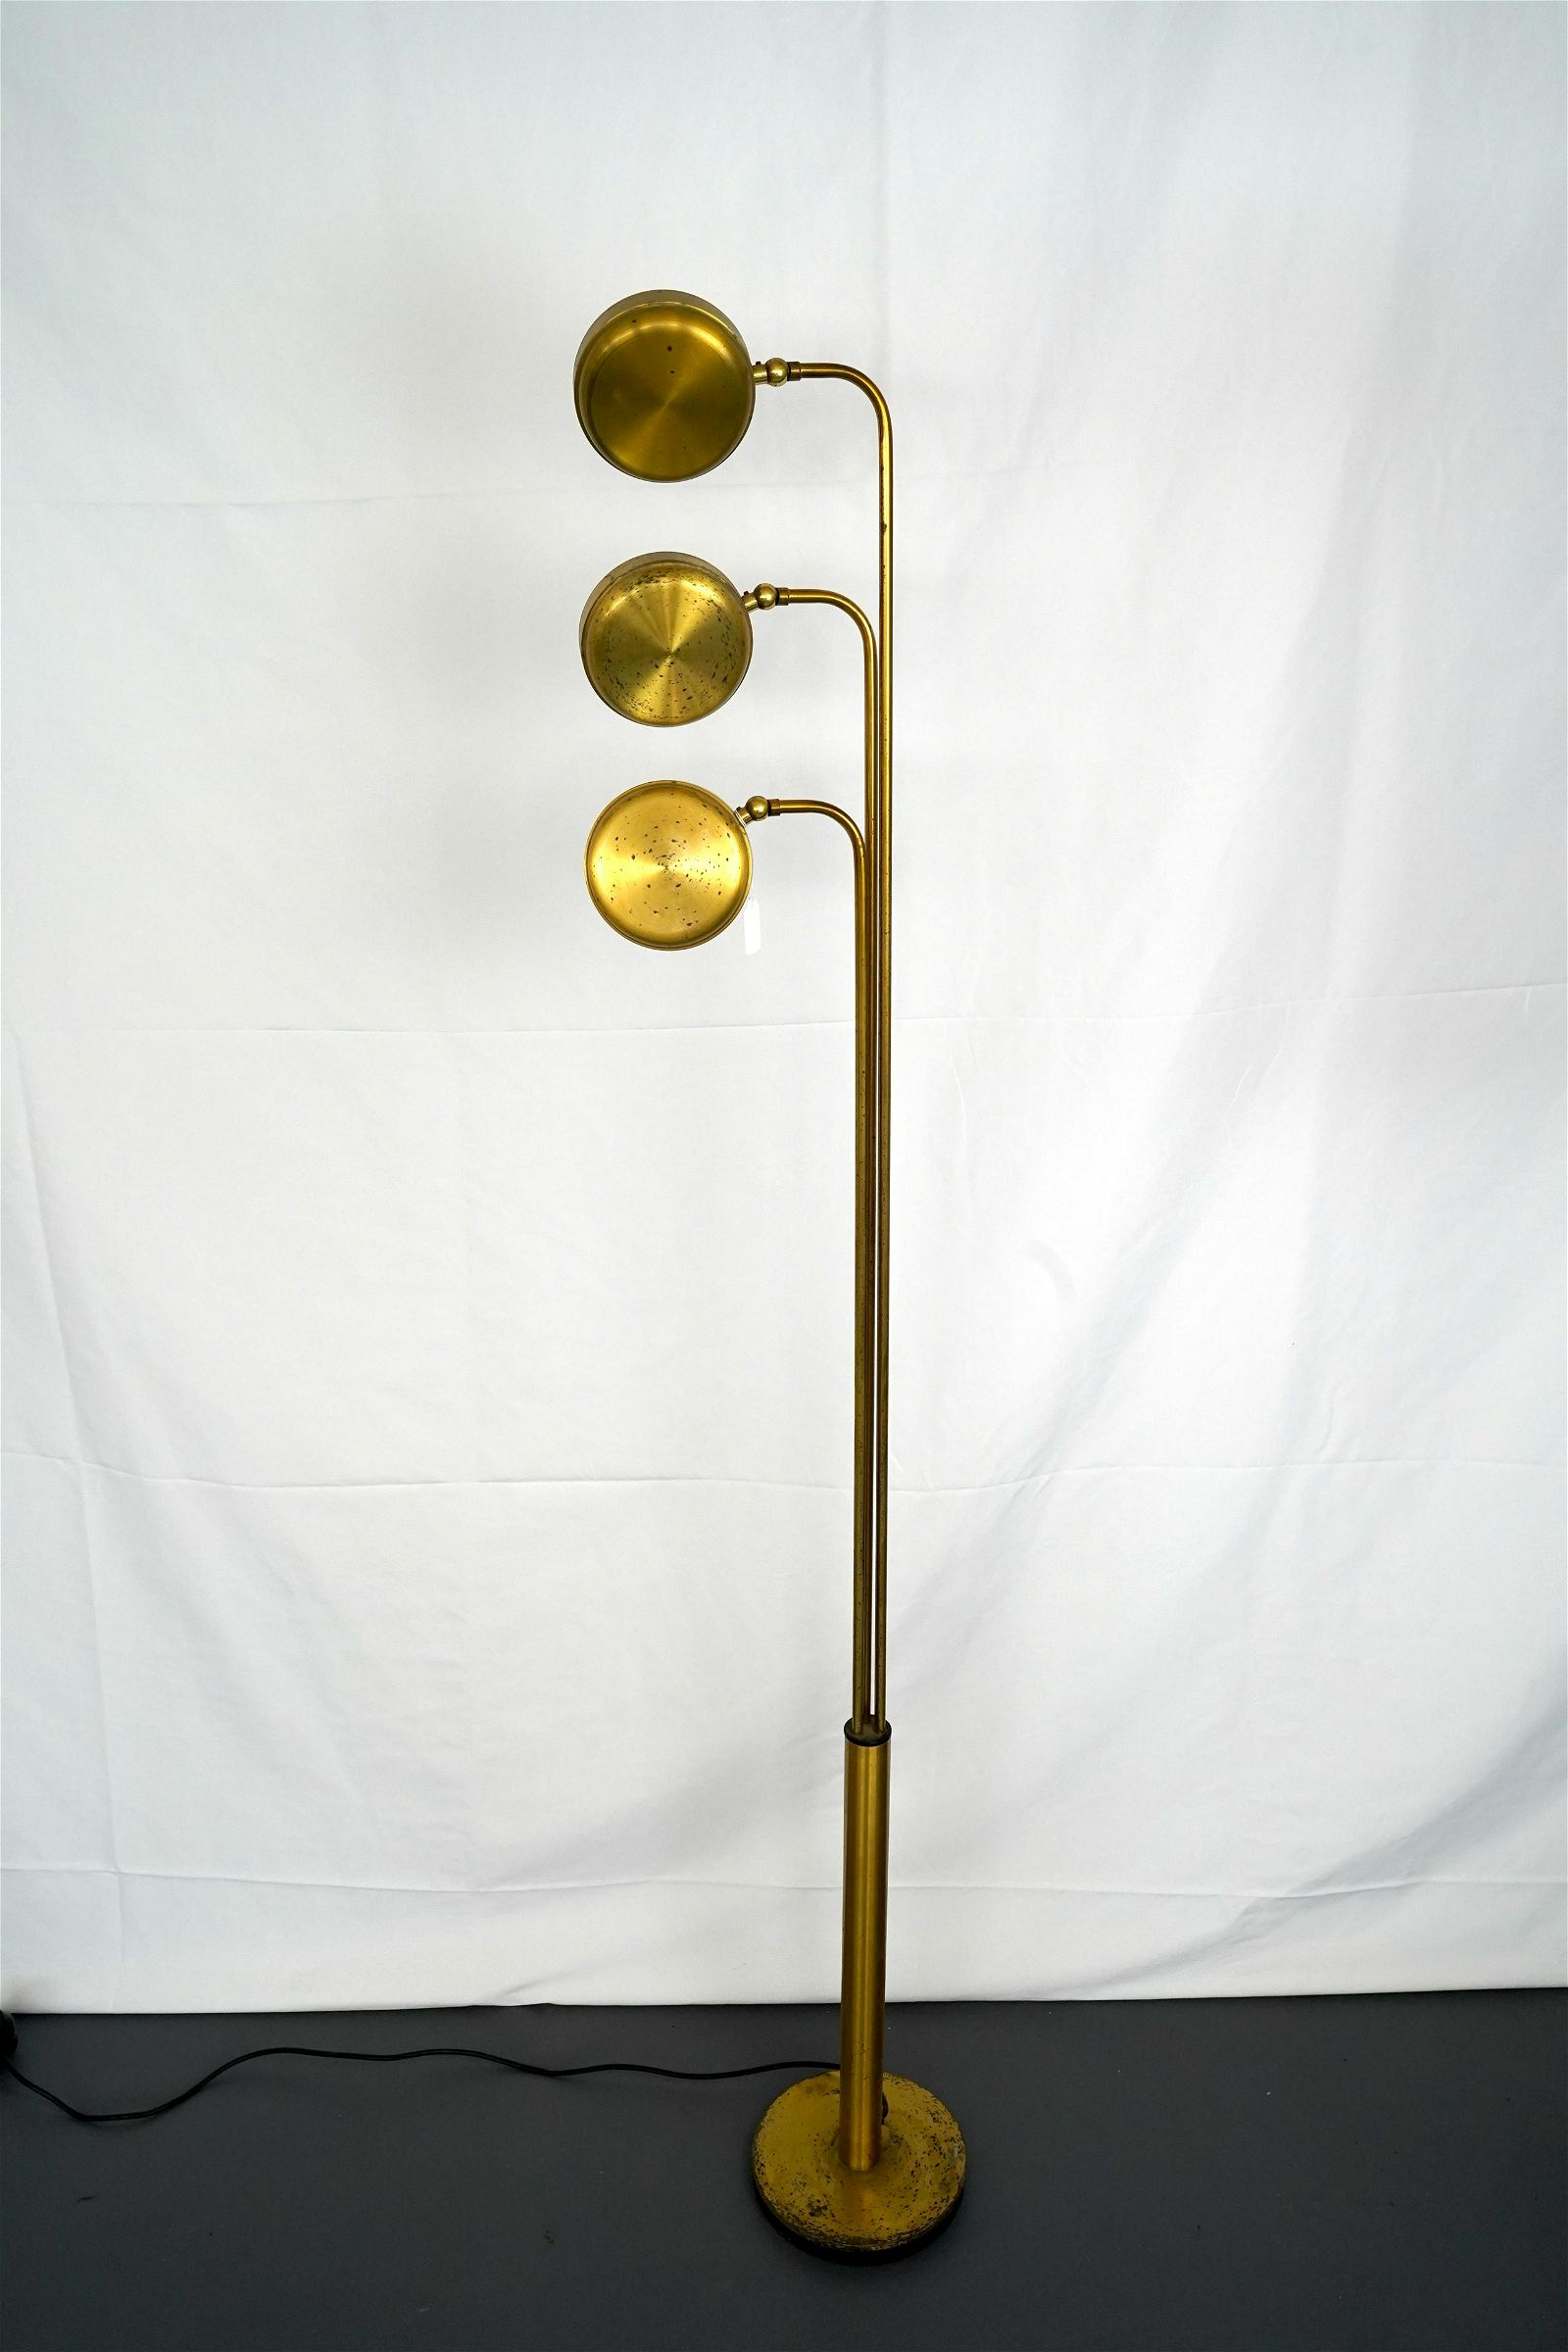 Italian vintage three arms brass floor lamp by Goffredo